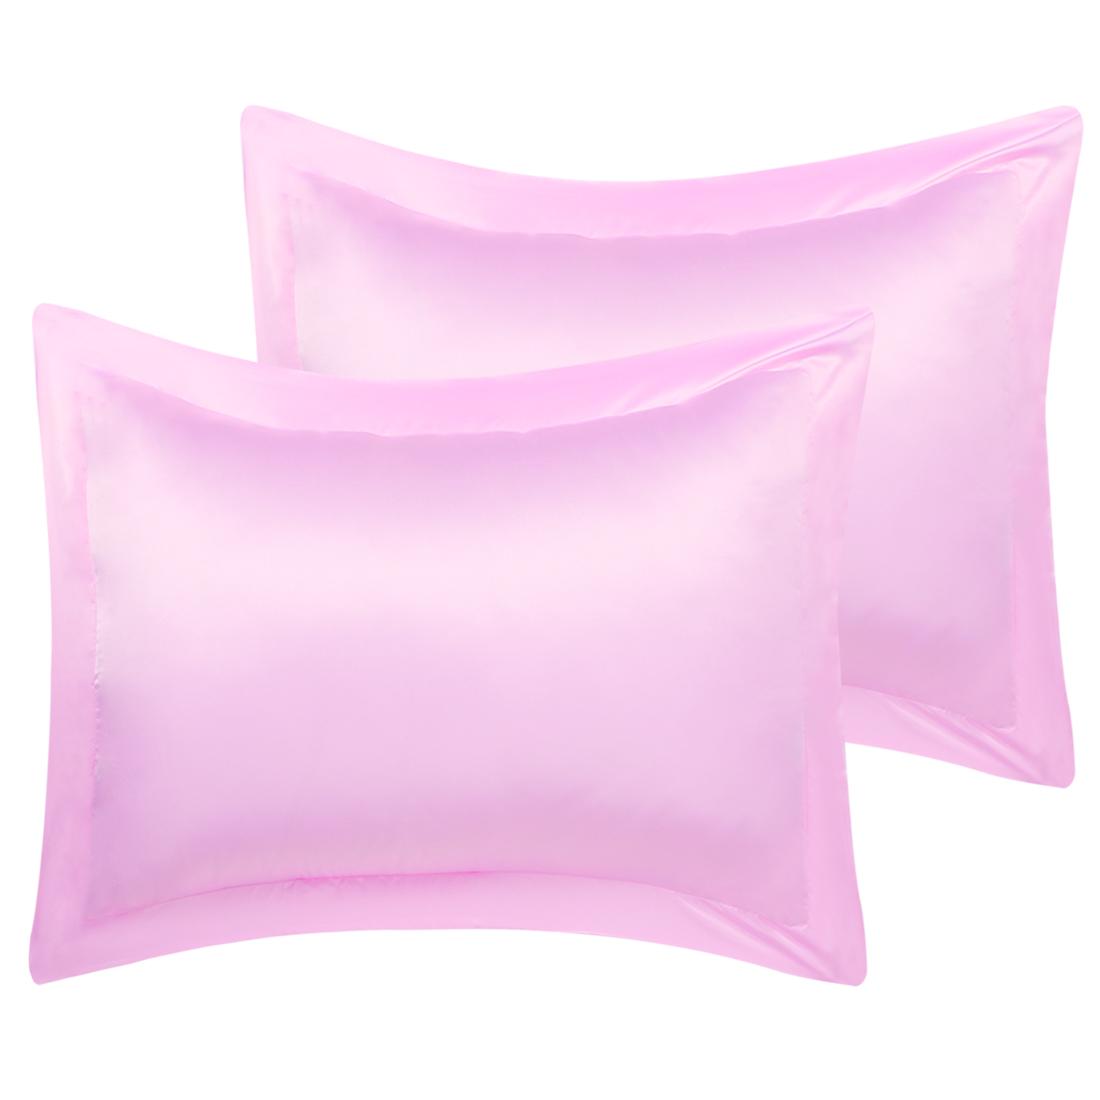 2 Pcs Pink Pillow Shams Satin Pillow Cases Boudoir Oxford Pillowcases